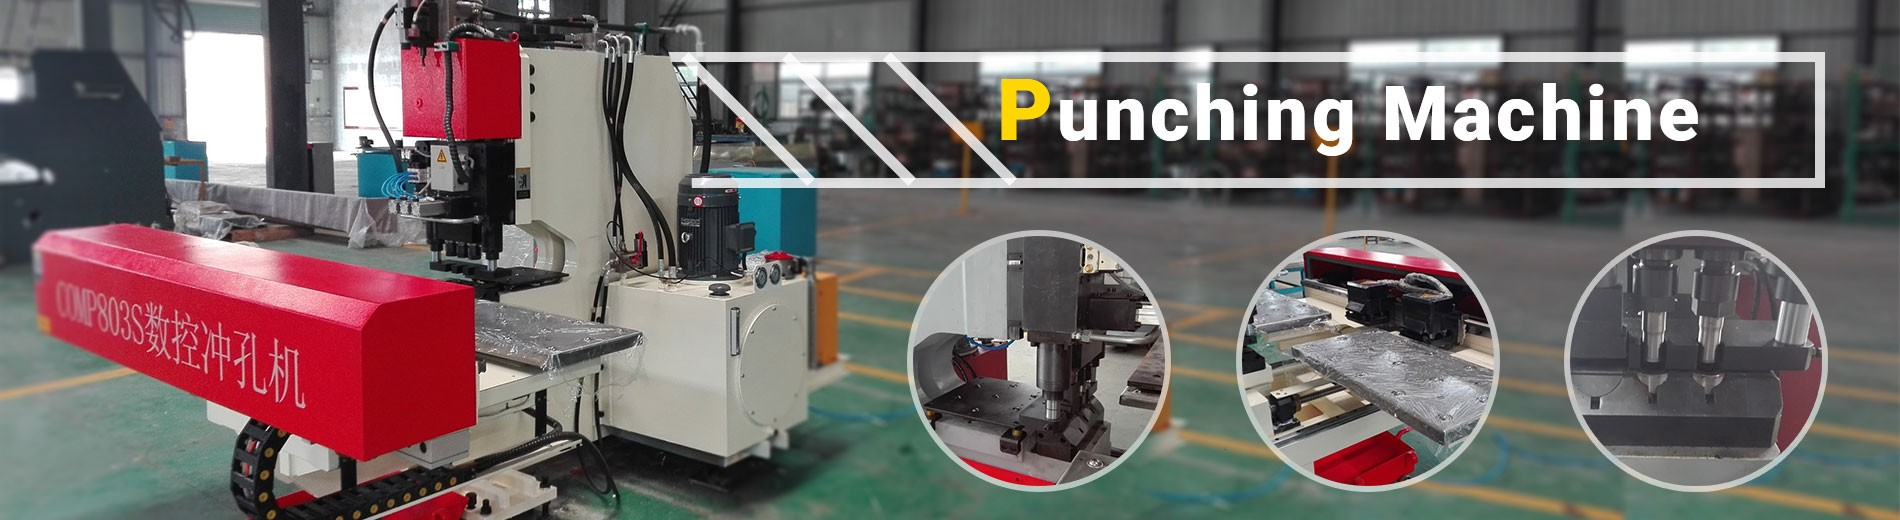 Cnc Punch Press For Sale, Cnc Punching Tools, Cnc Busbar Punching Machine